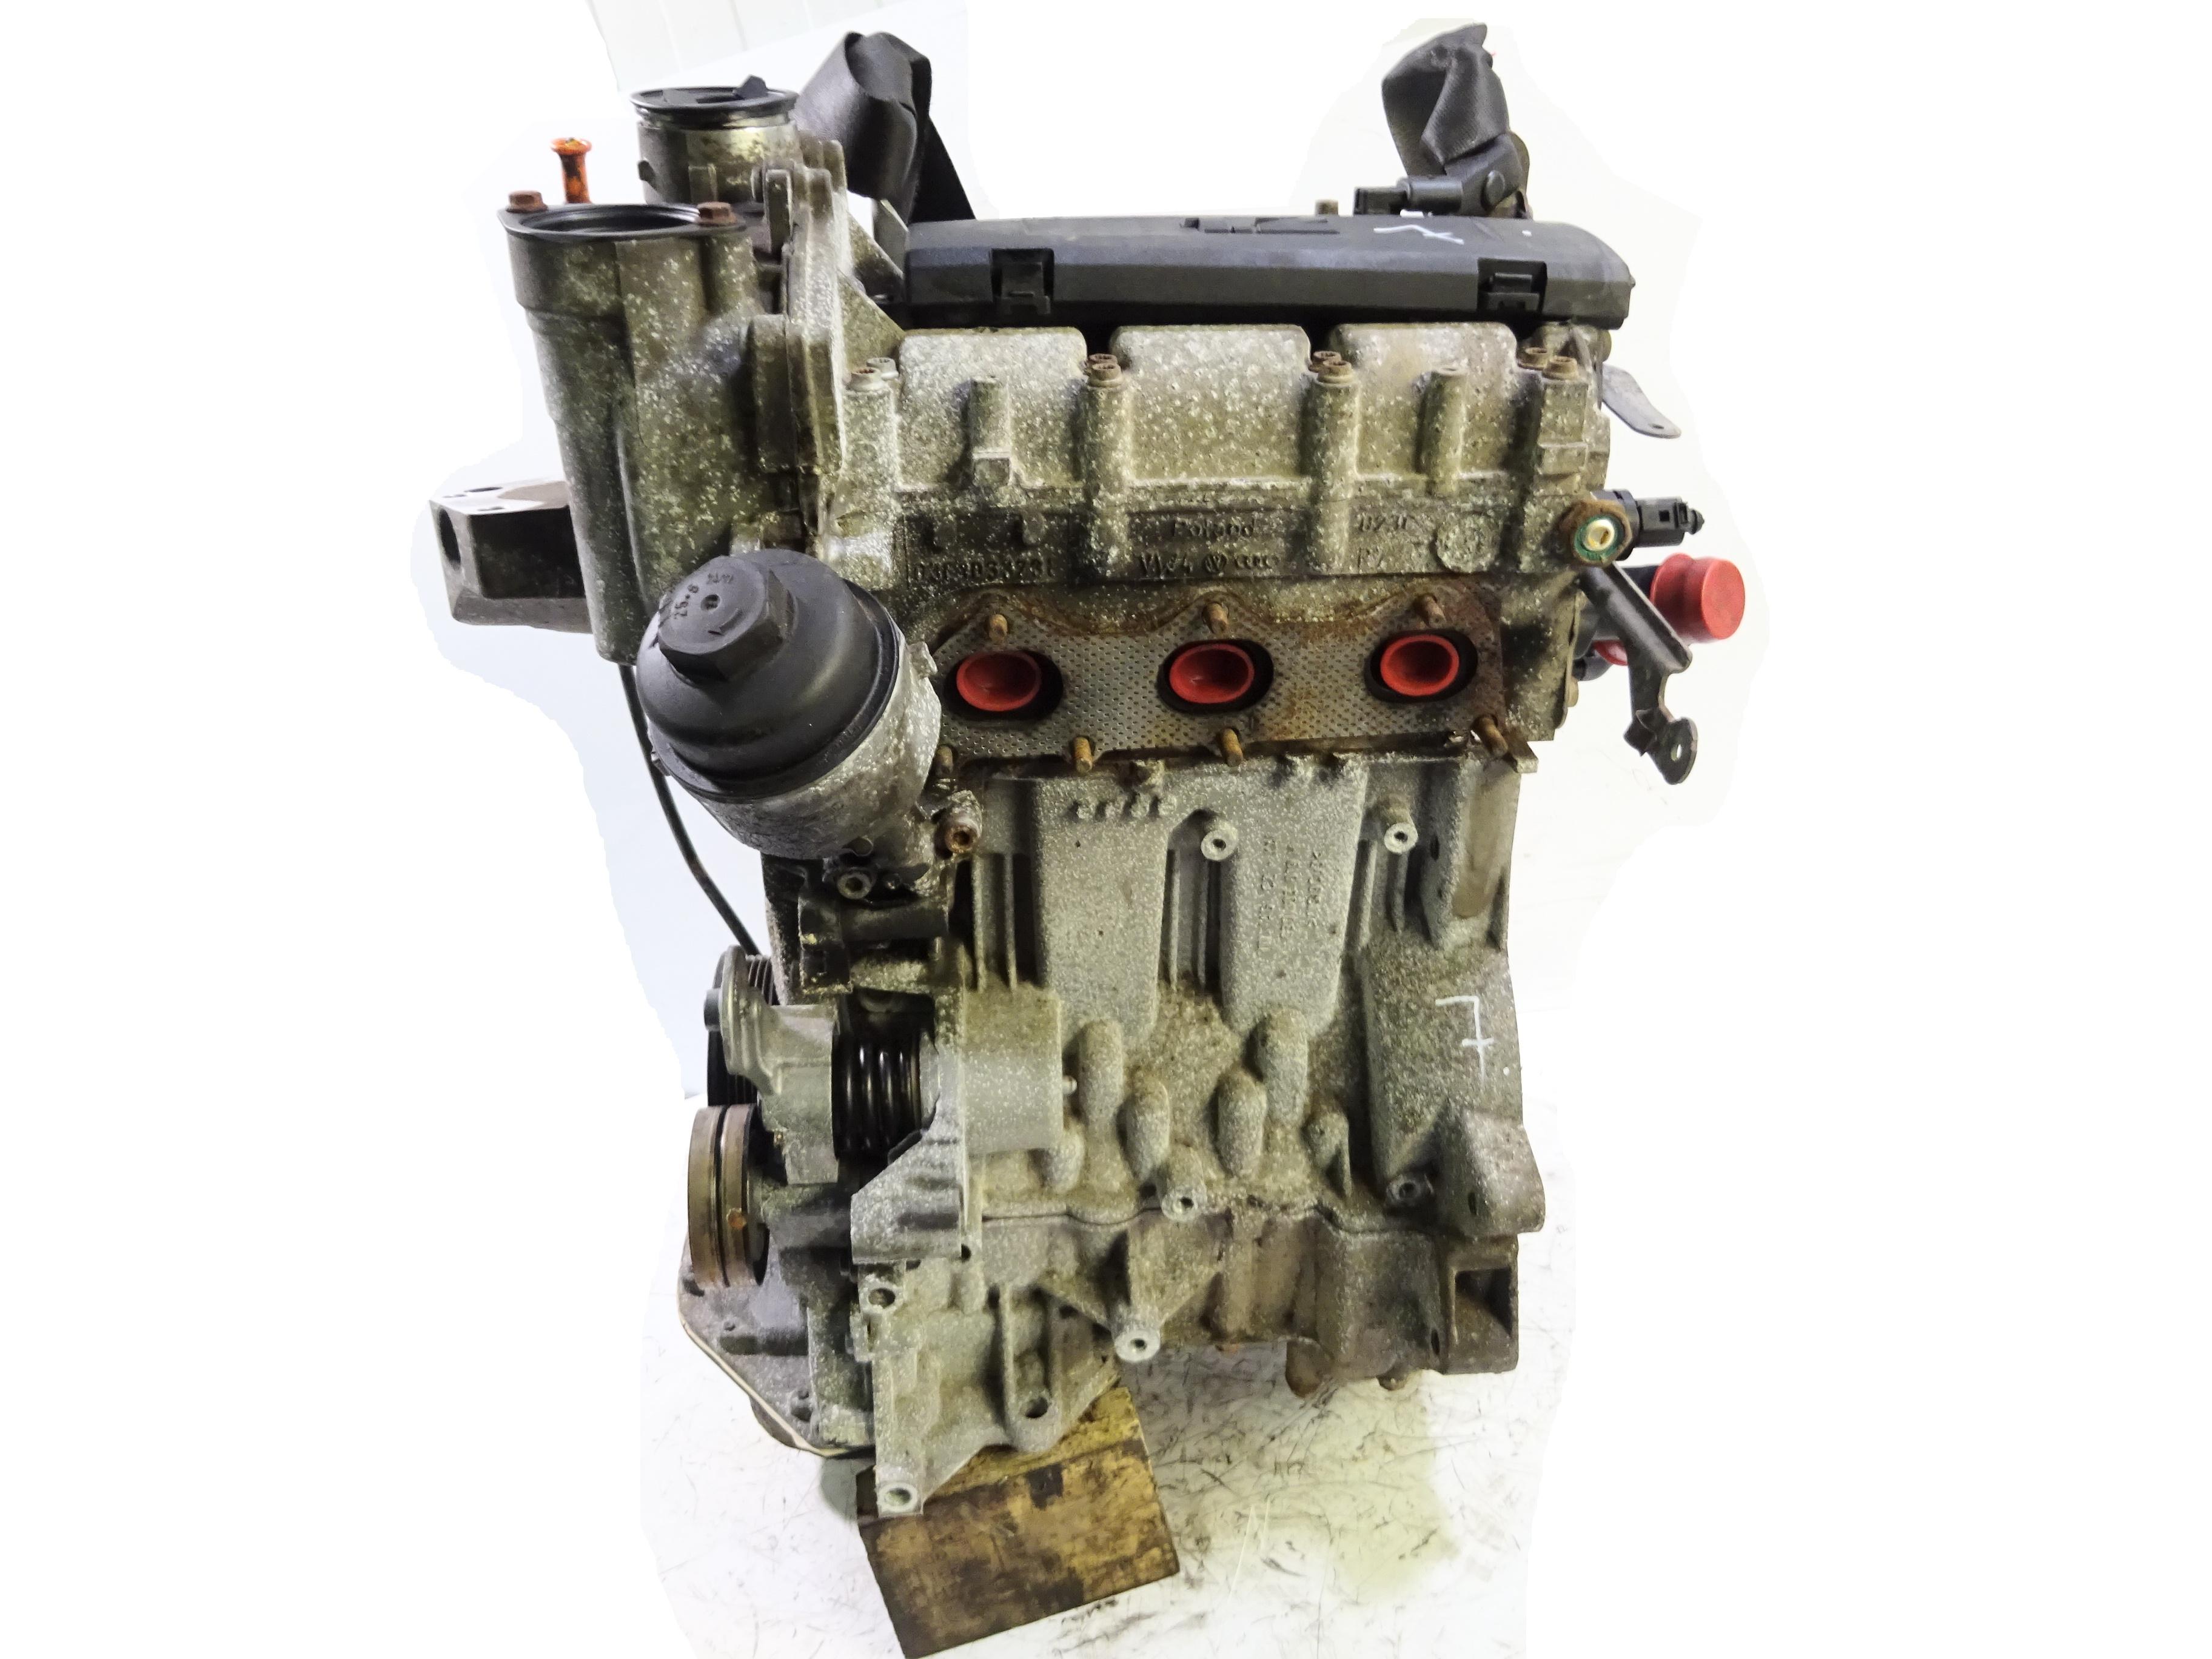 Motor für Skoda Fabia MK2 542 1,2 BZG 70 PS